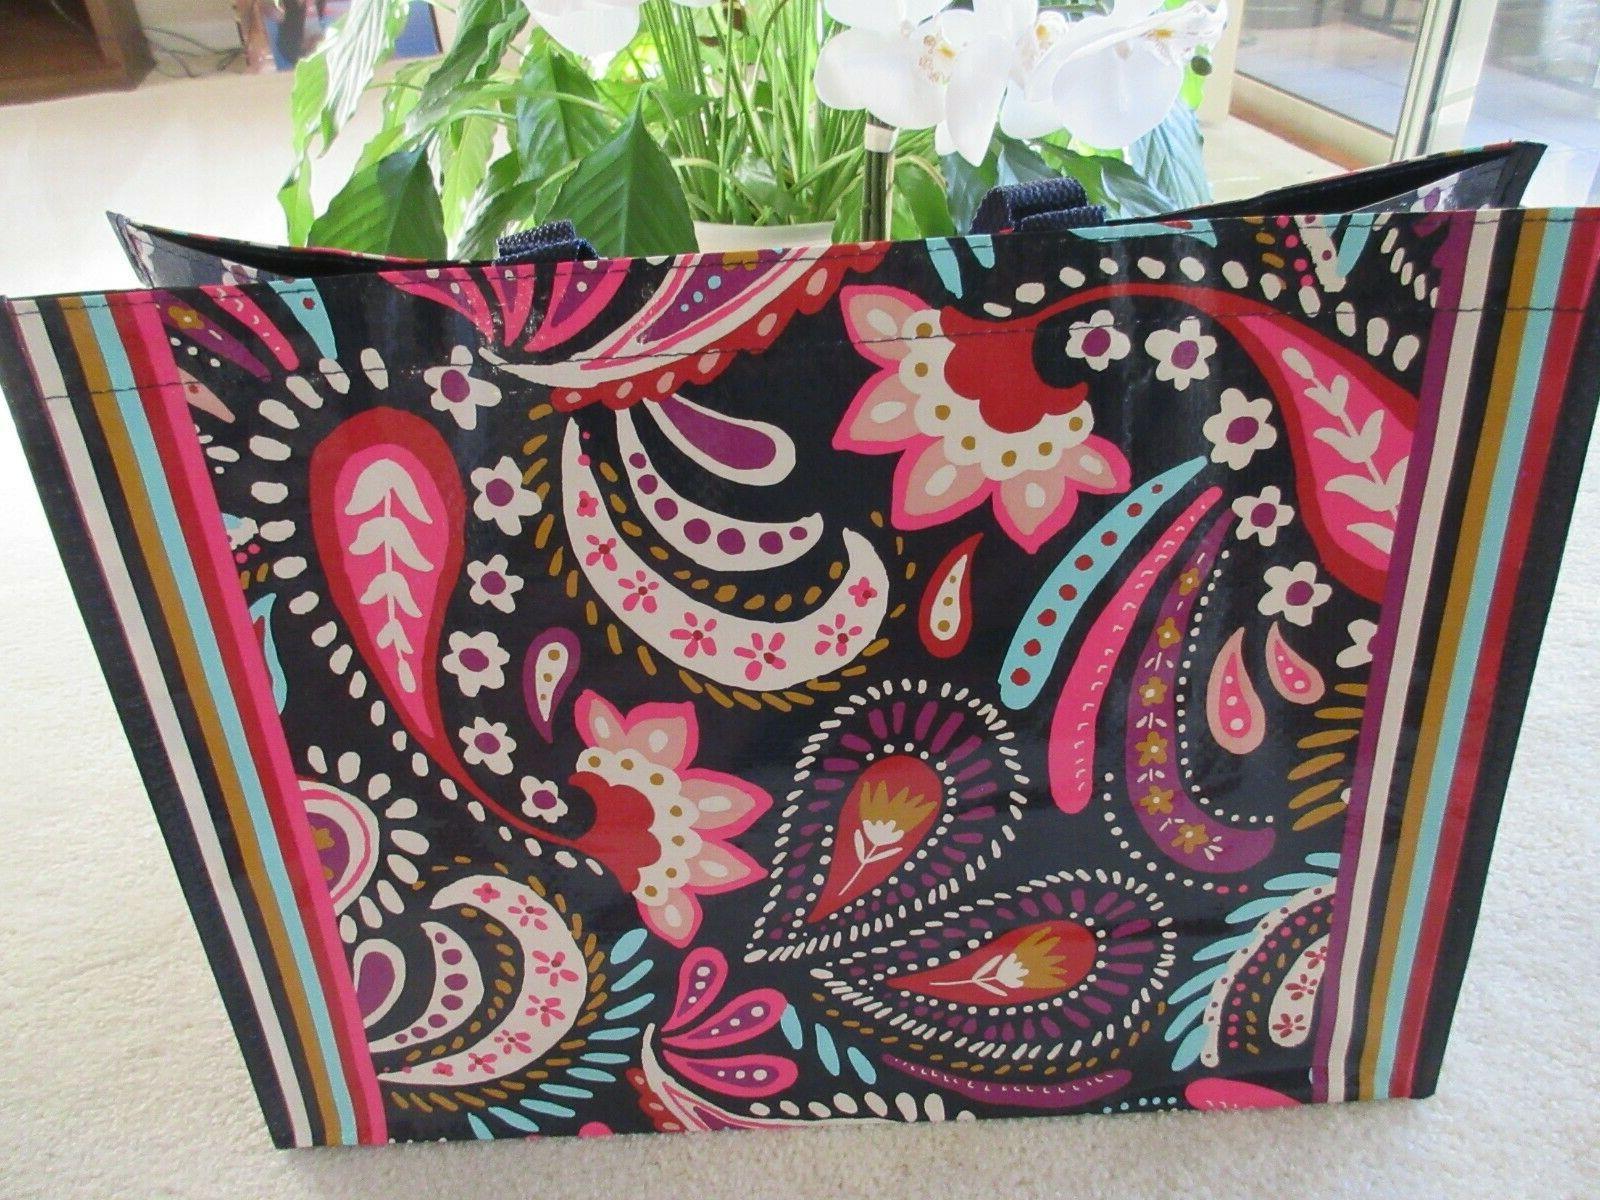 market tote reusable bag painted paisley print